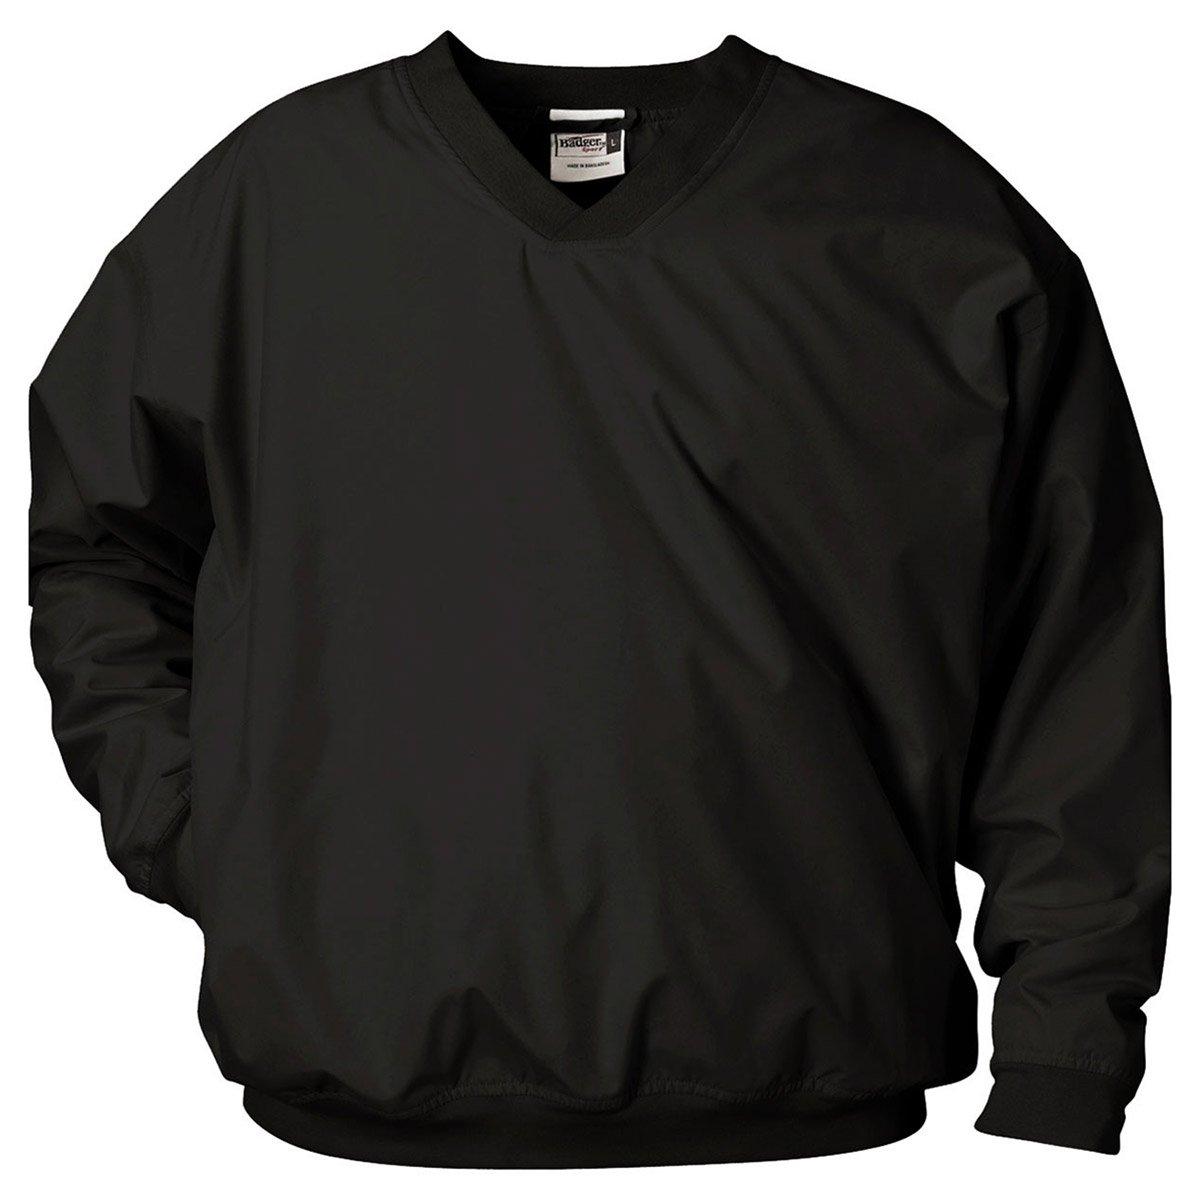 Badger Sport Microfiber Windshirt - 7618 - Black - XX-Large